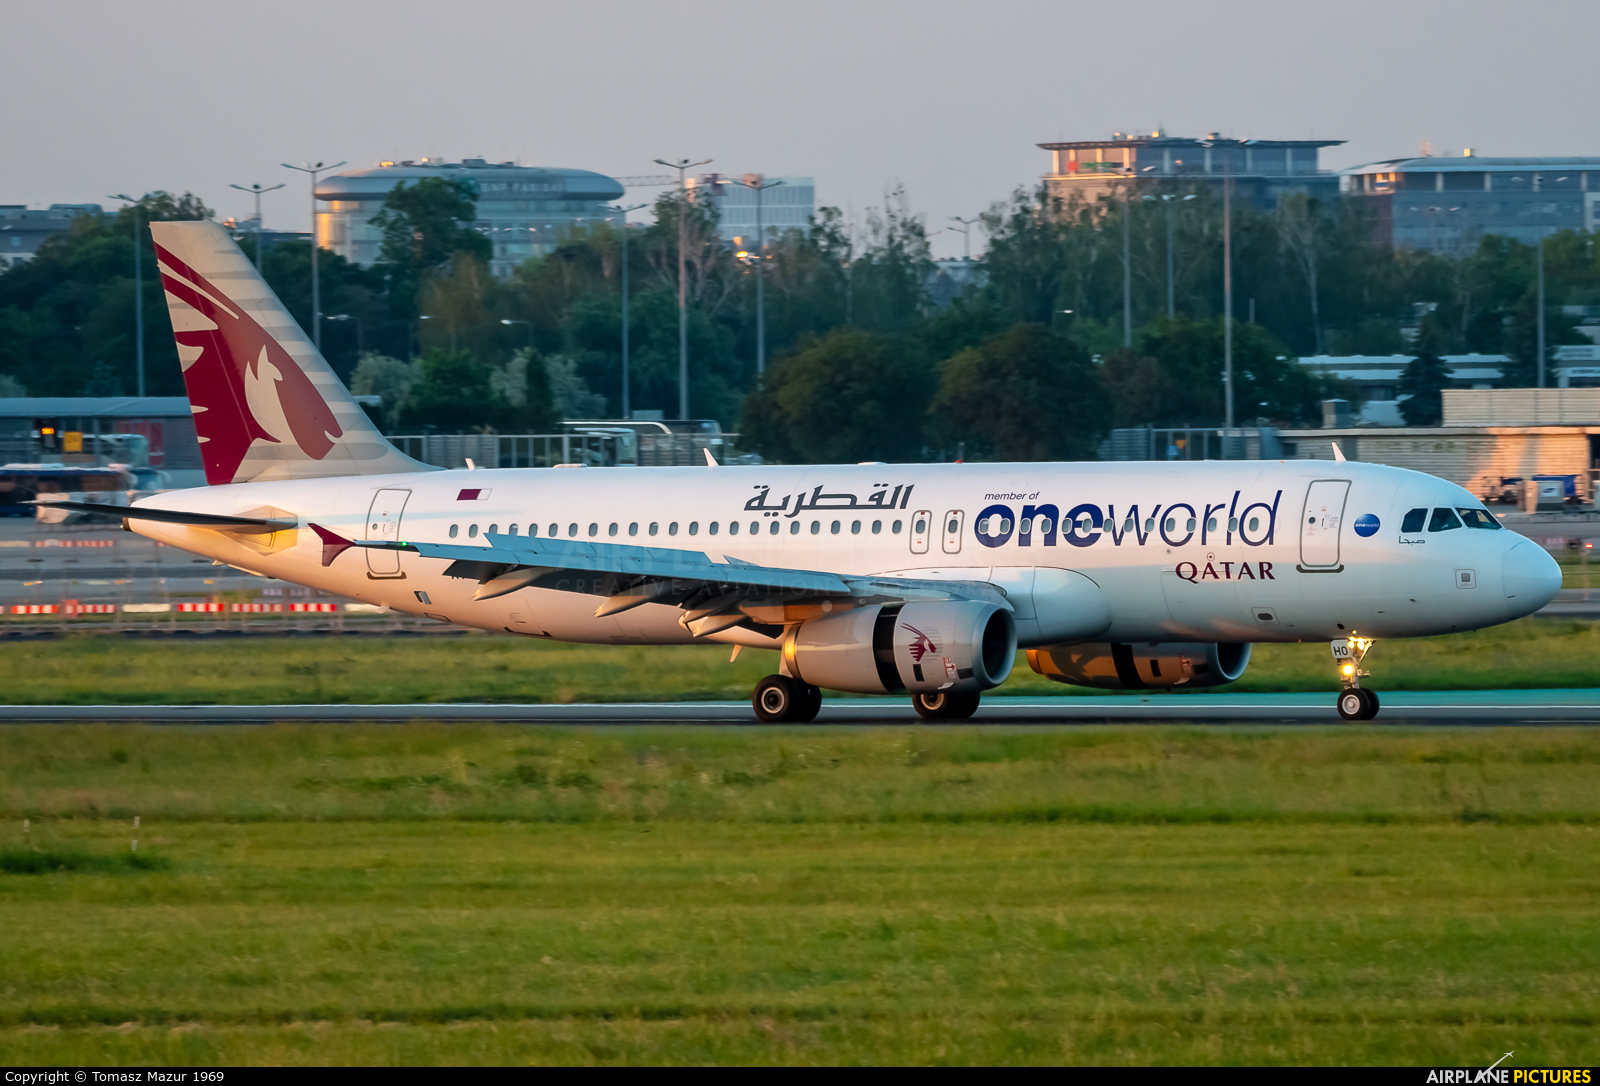 Qatar Airways A7-AHO aircraft at Warsaw - Frederic Chopin